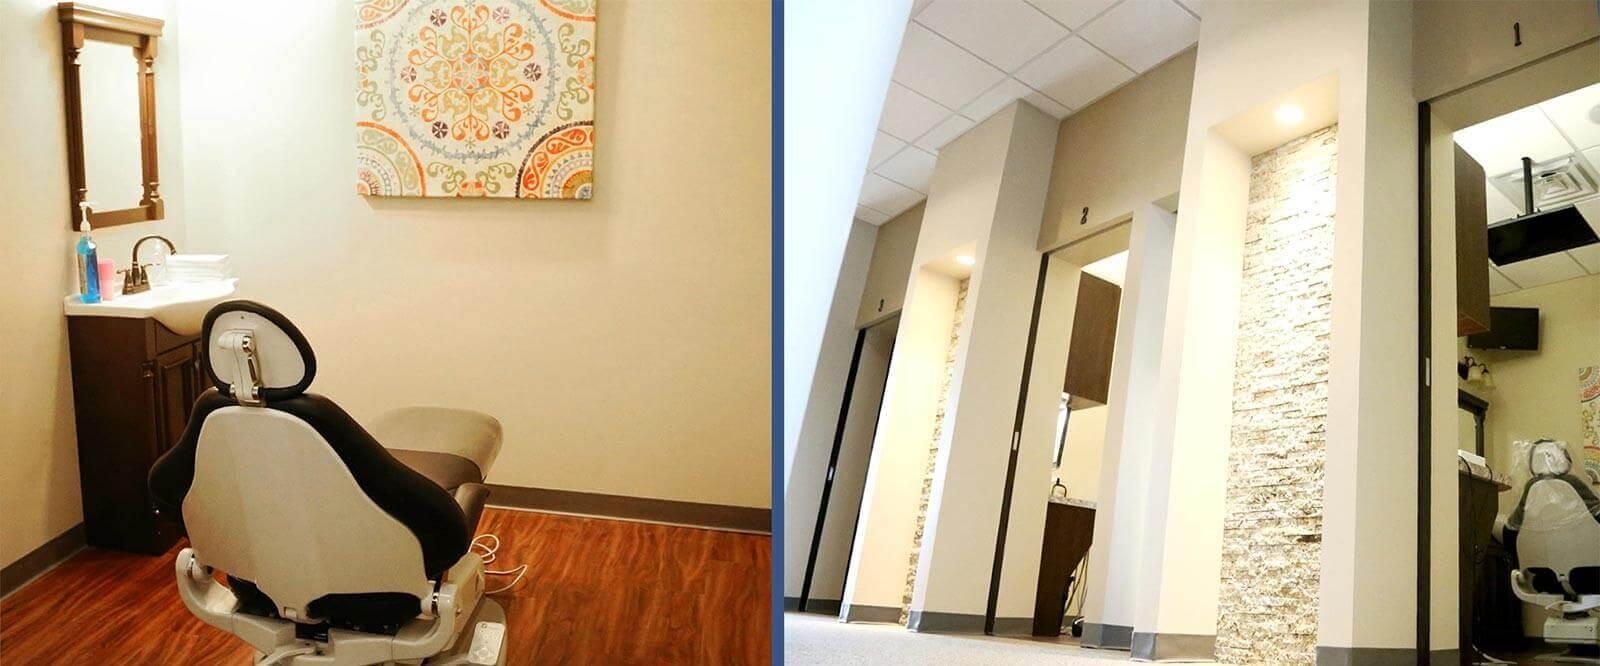 Hallway/Operatory Room - Overland Park Family Dental